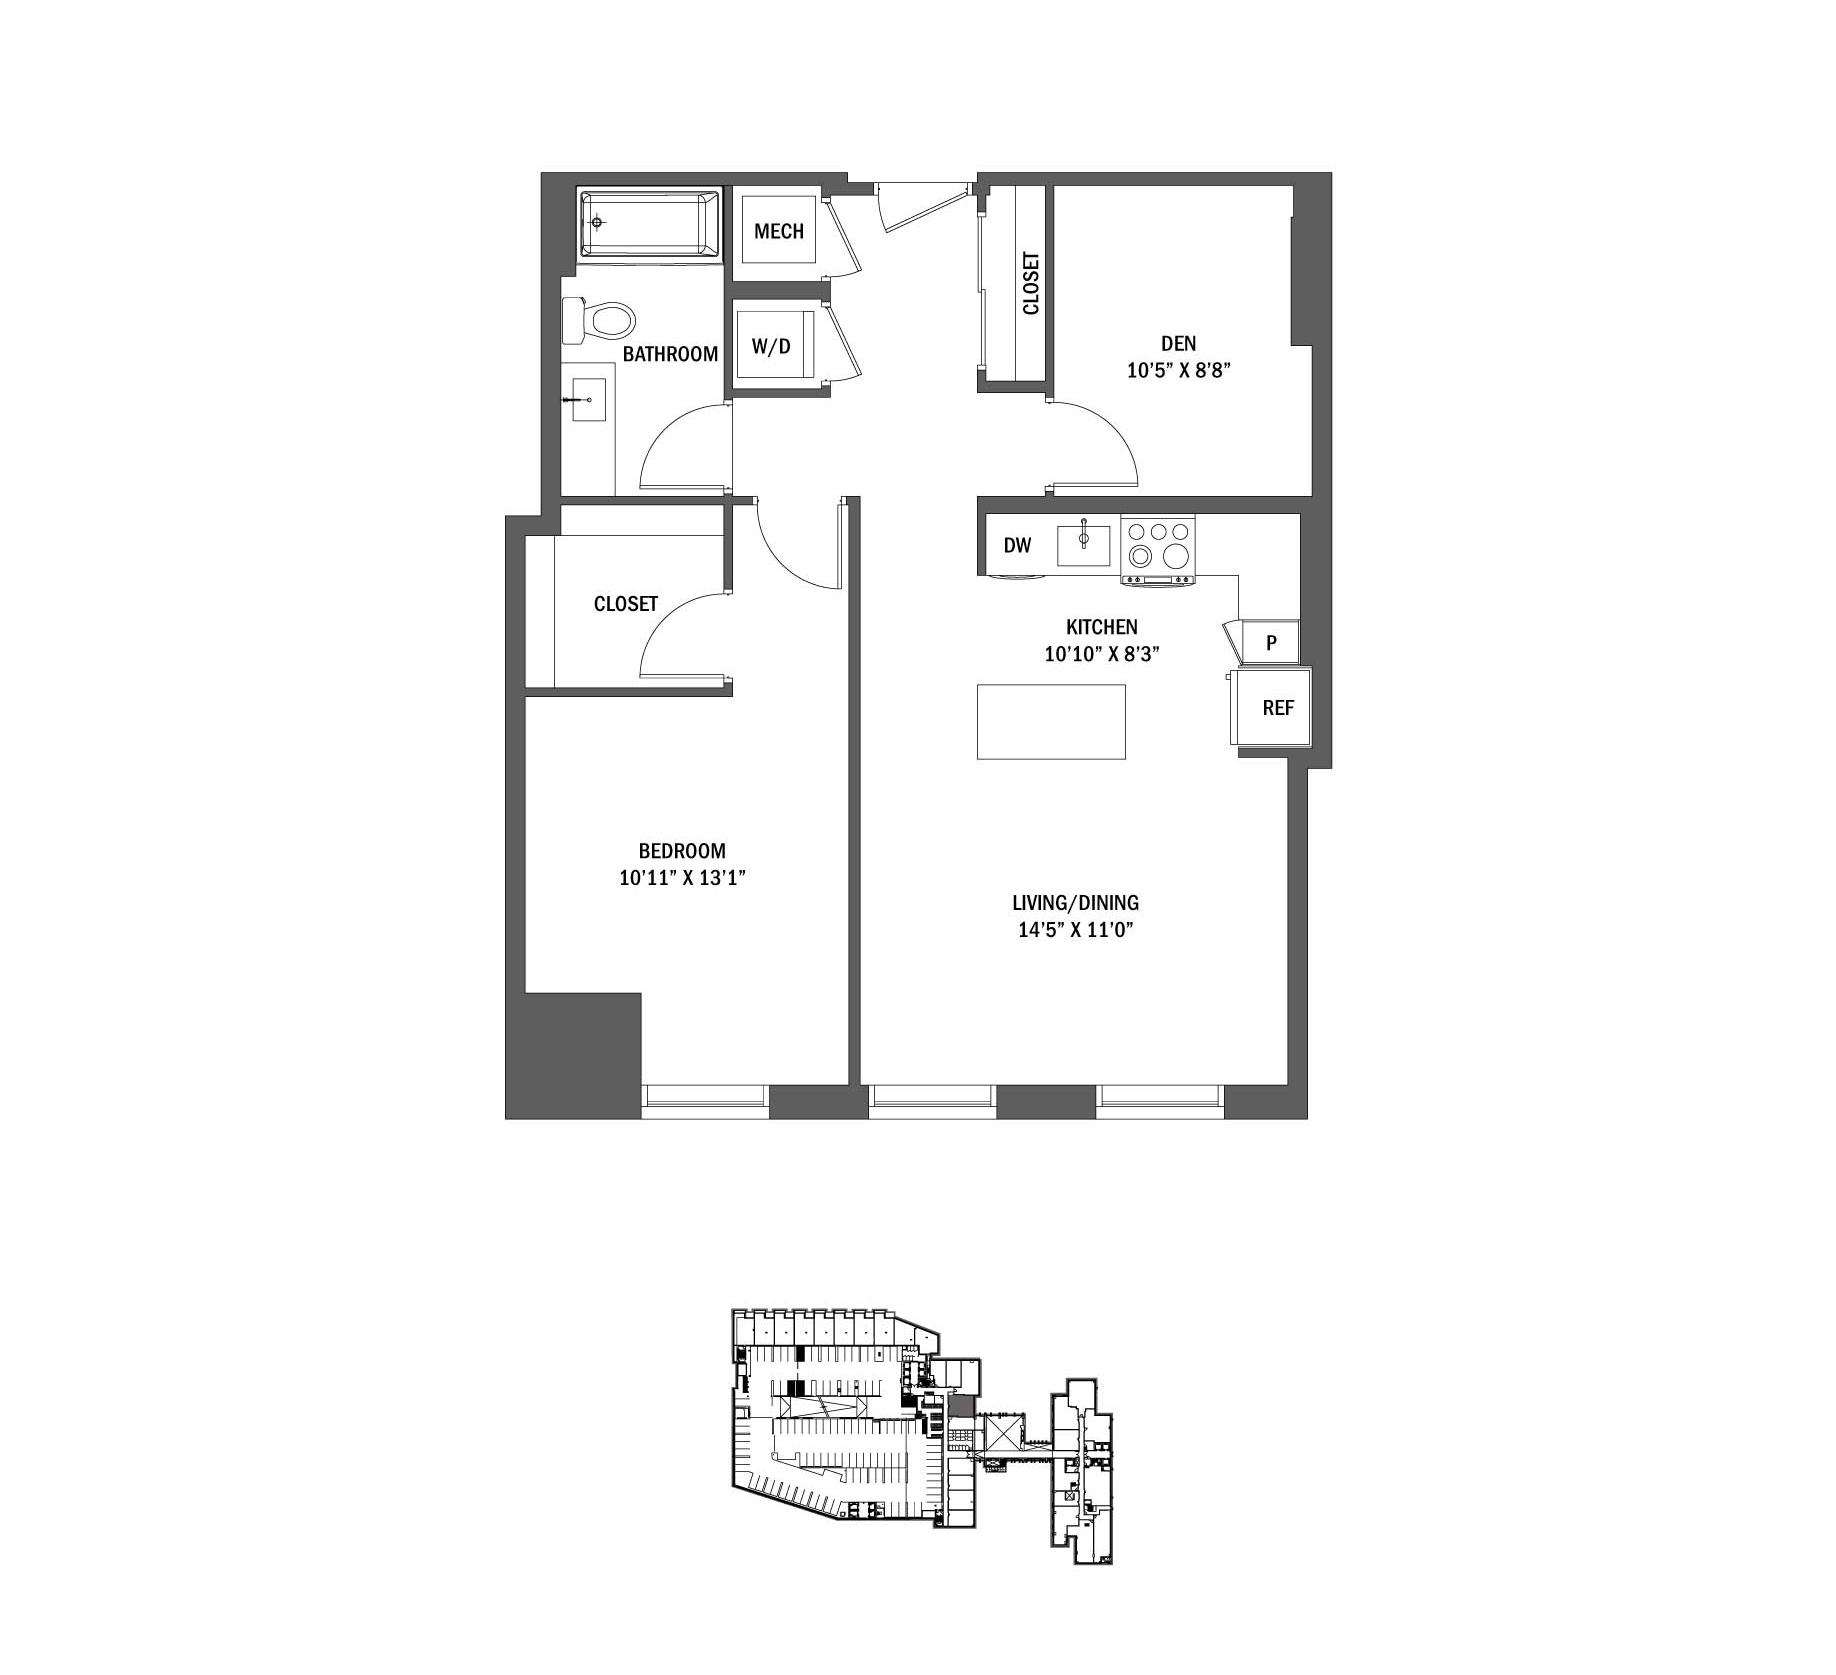 P0625338 s04 02 2 floorplan